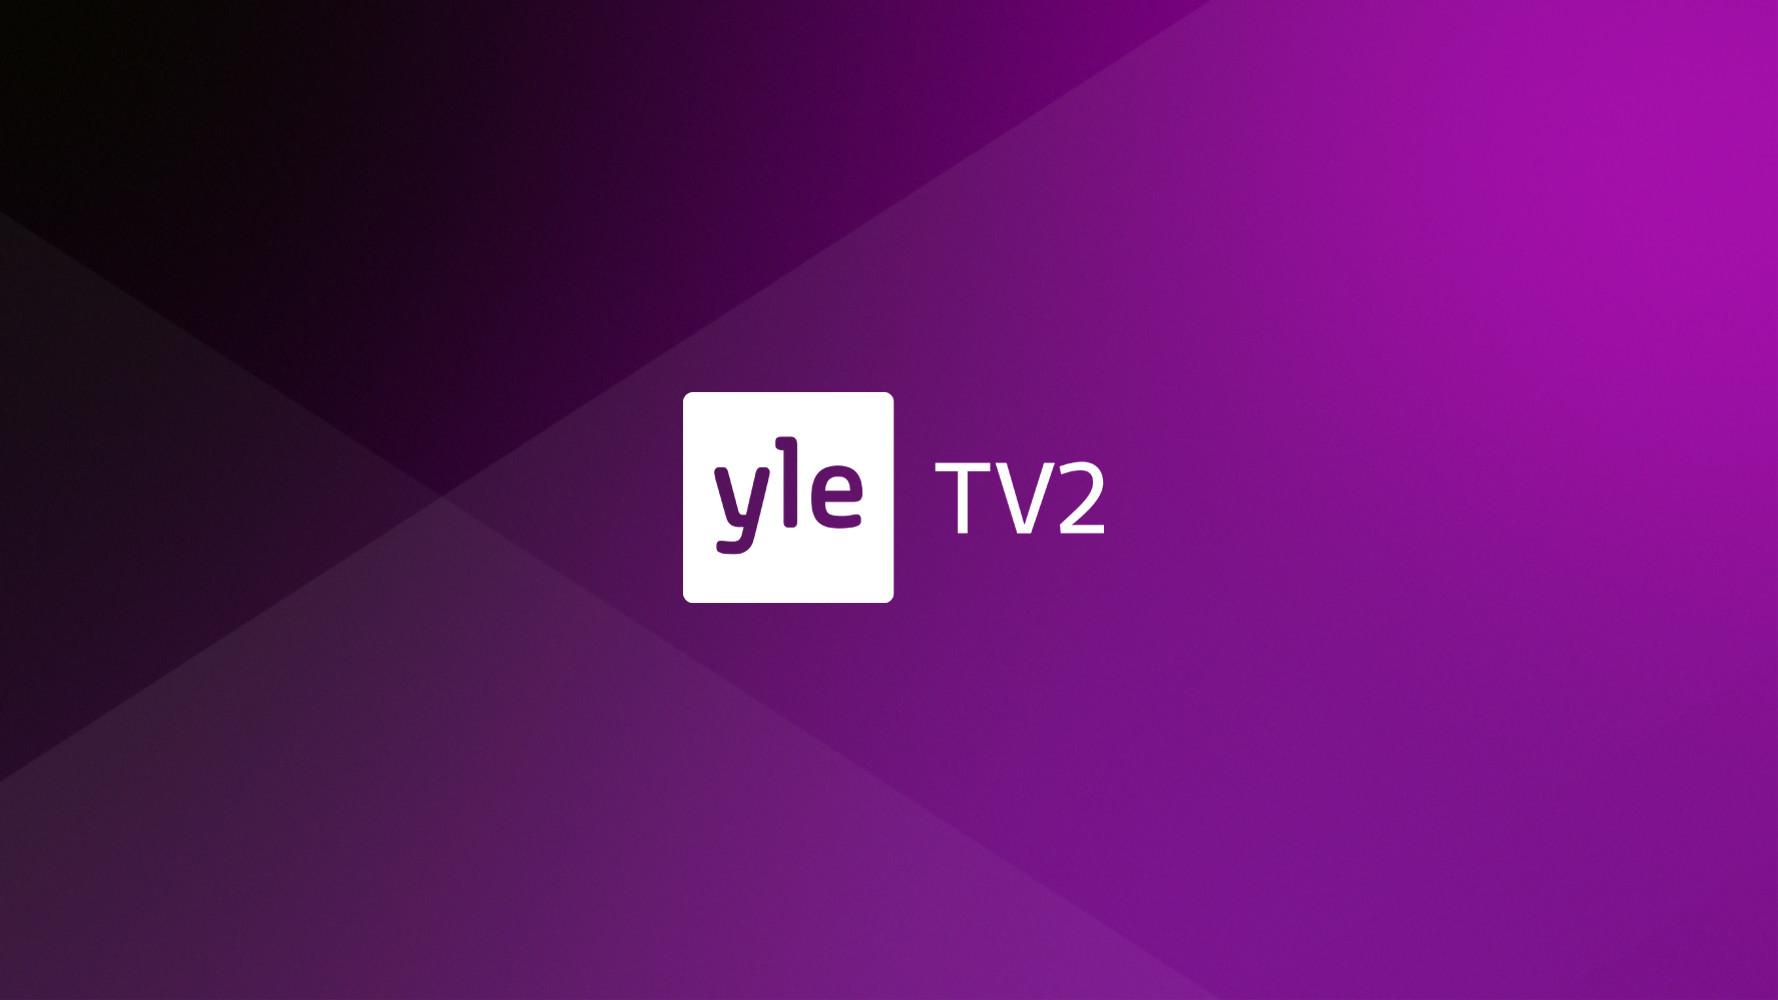 Yle TV2 | TV | Arenan | svenska.yle.fi